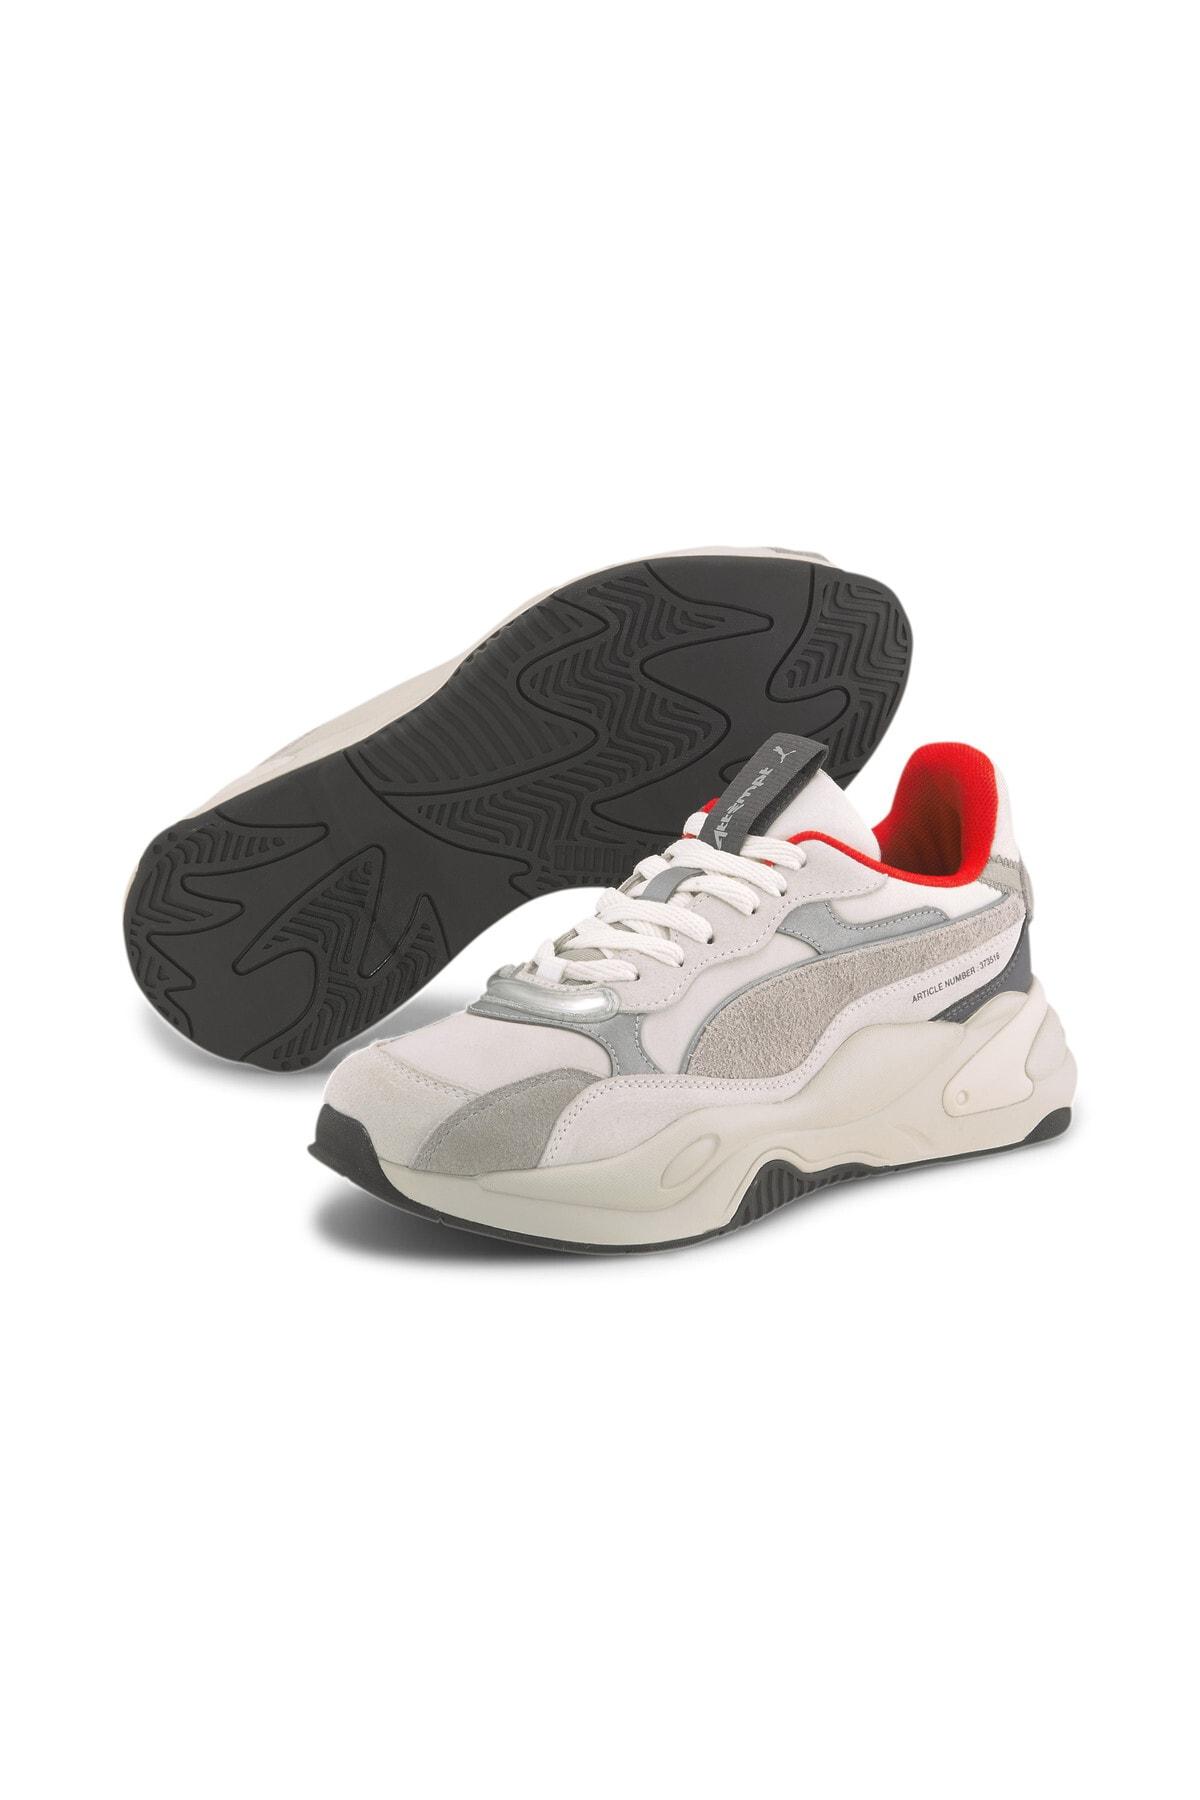 Puma X Attèmpt Rs-2k Ayakkabı 1